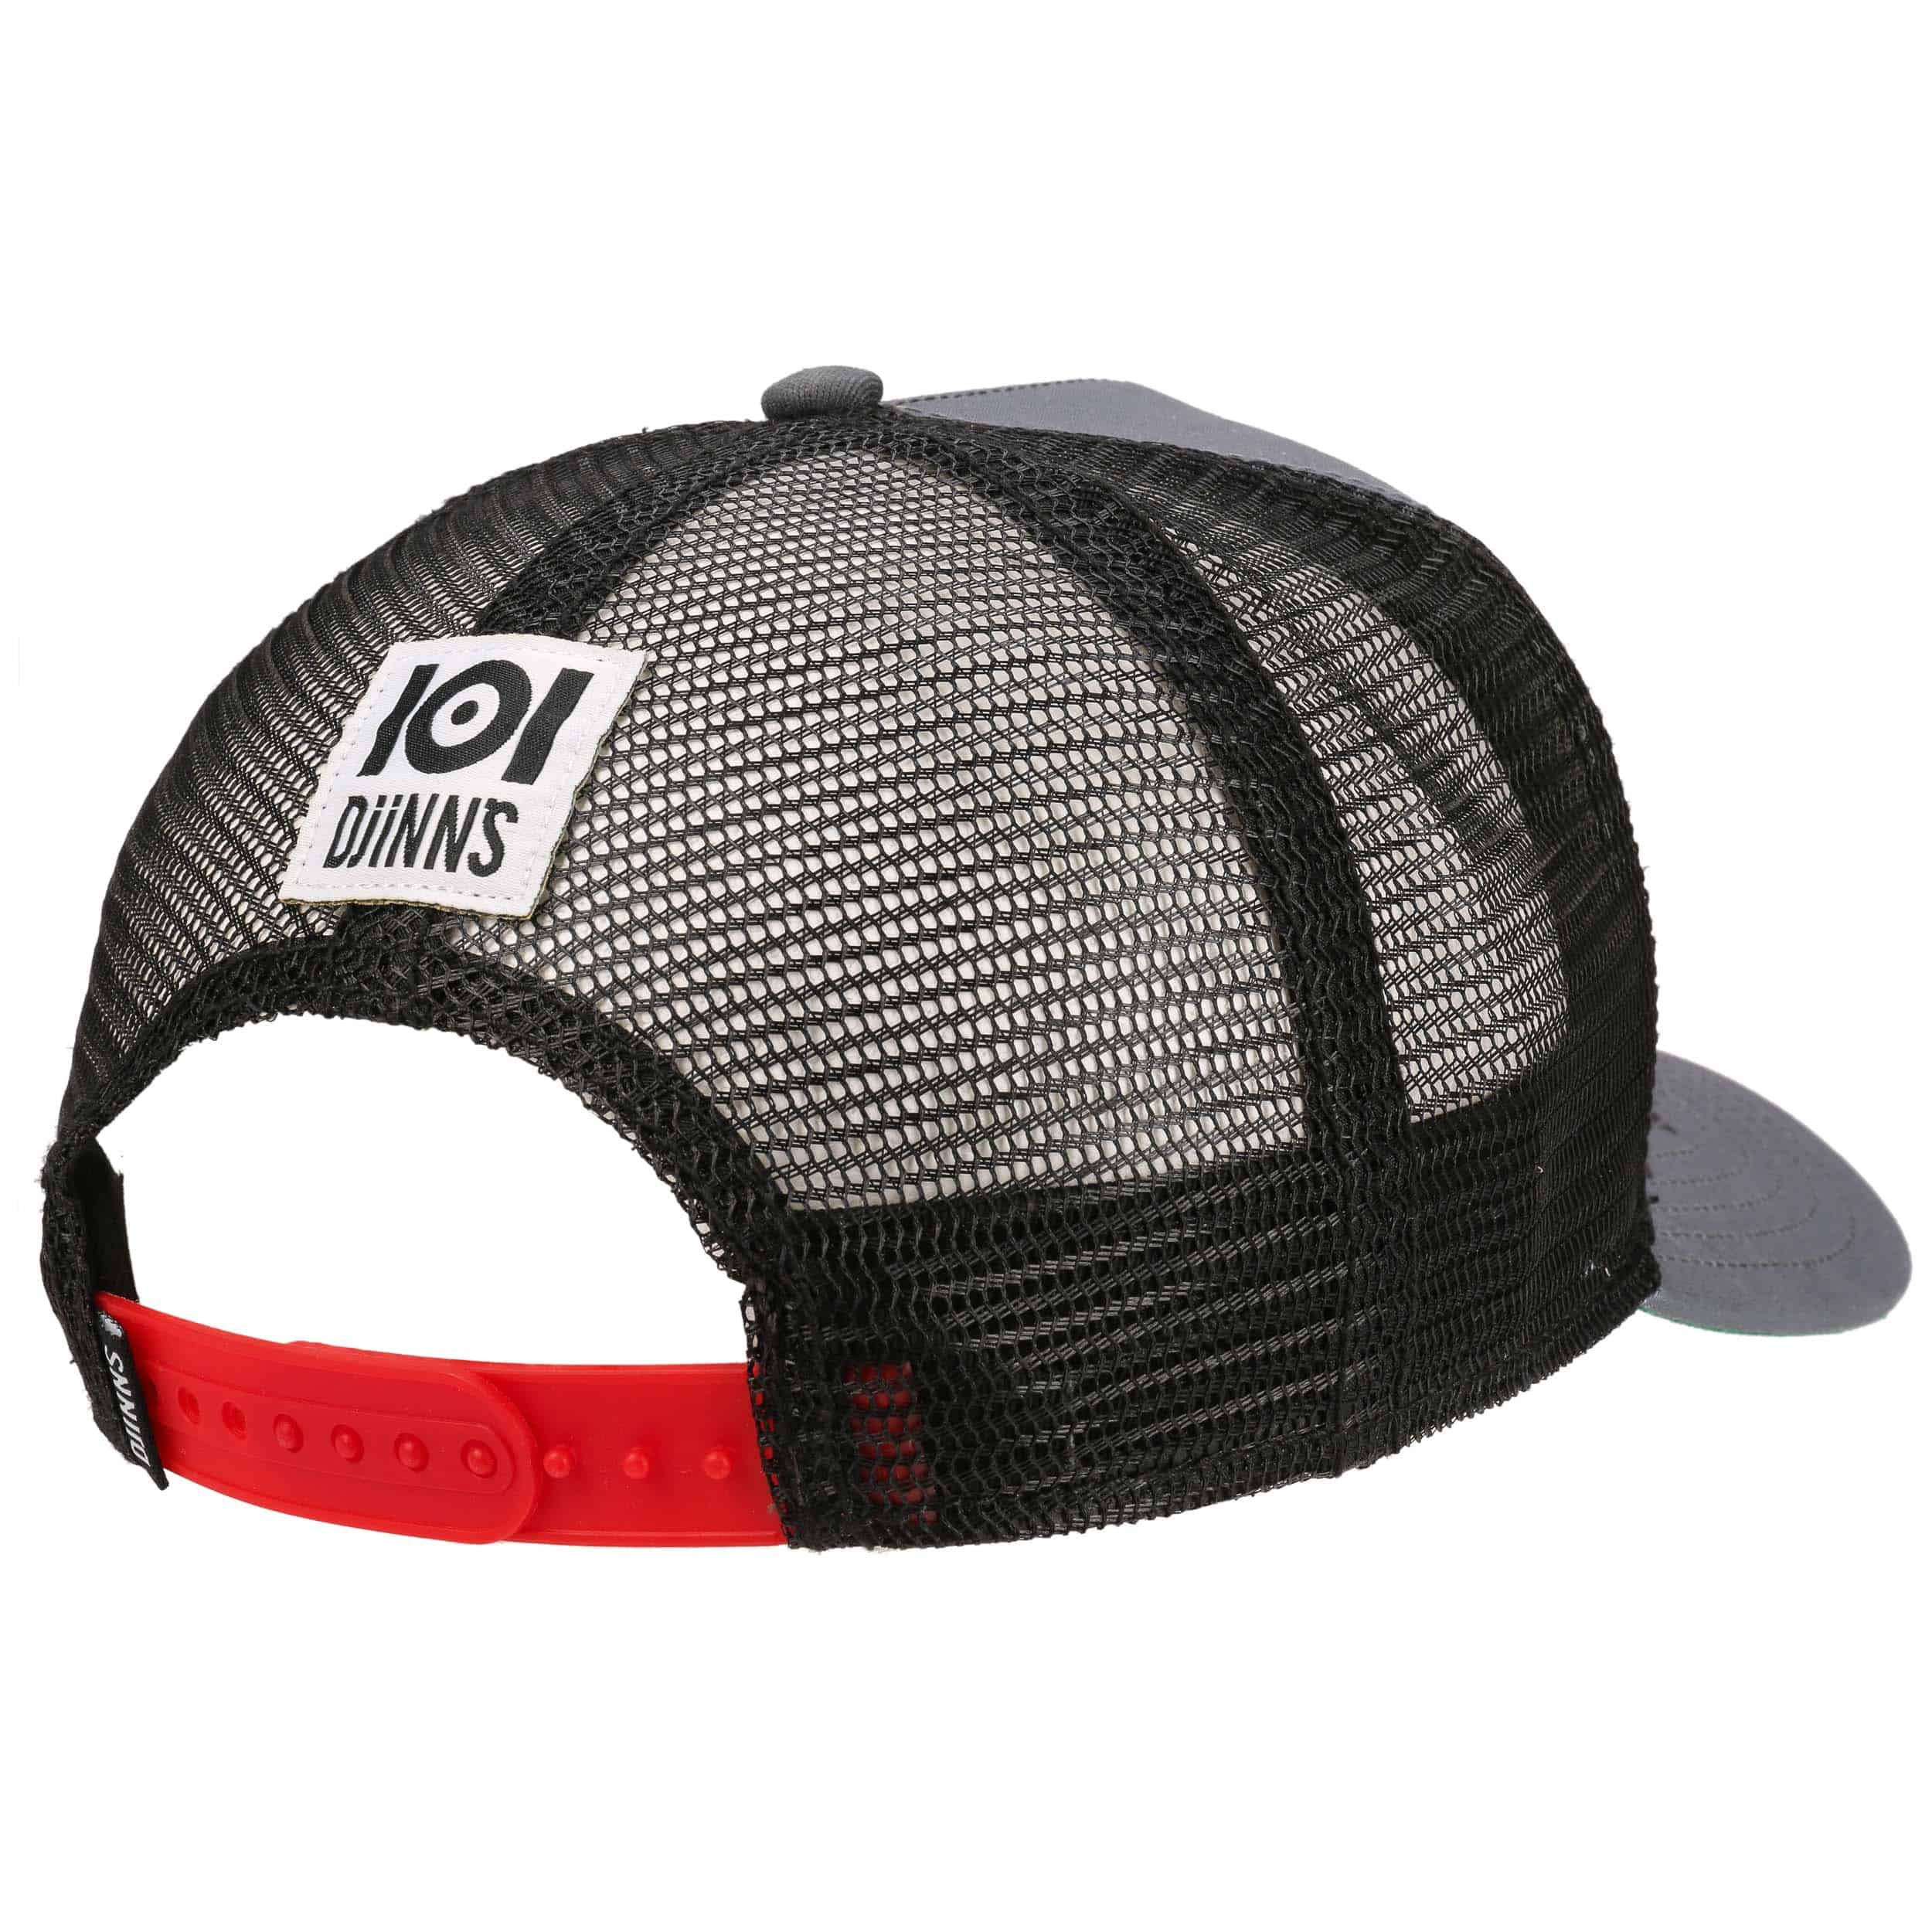 kingston hft 101 trucker cap by djinns eur 24 95 hats. Black Bedroom Furniture Sets. Home Design Ideas